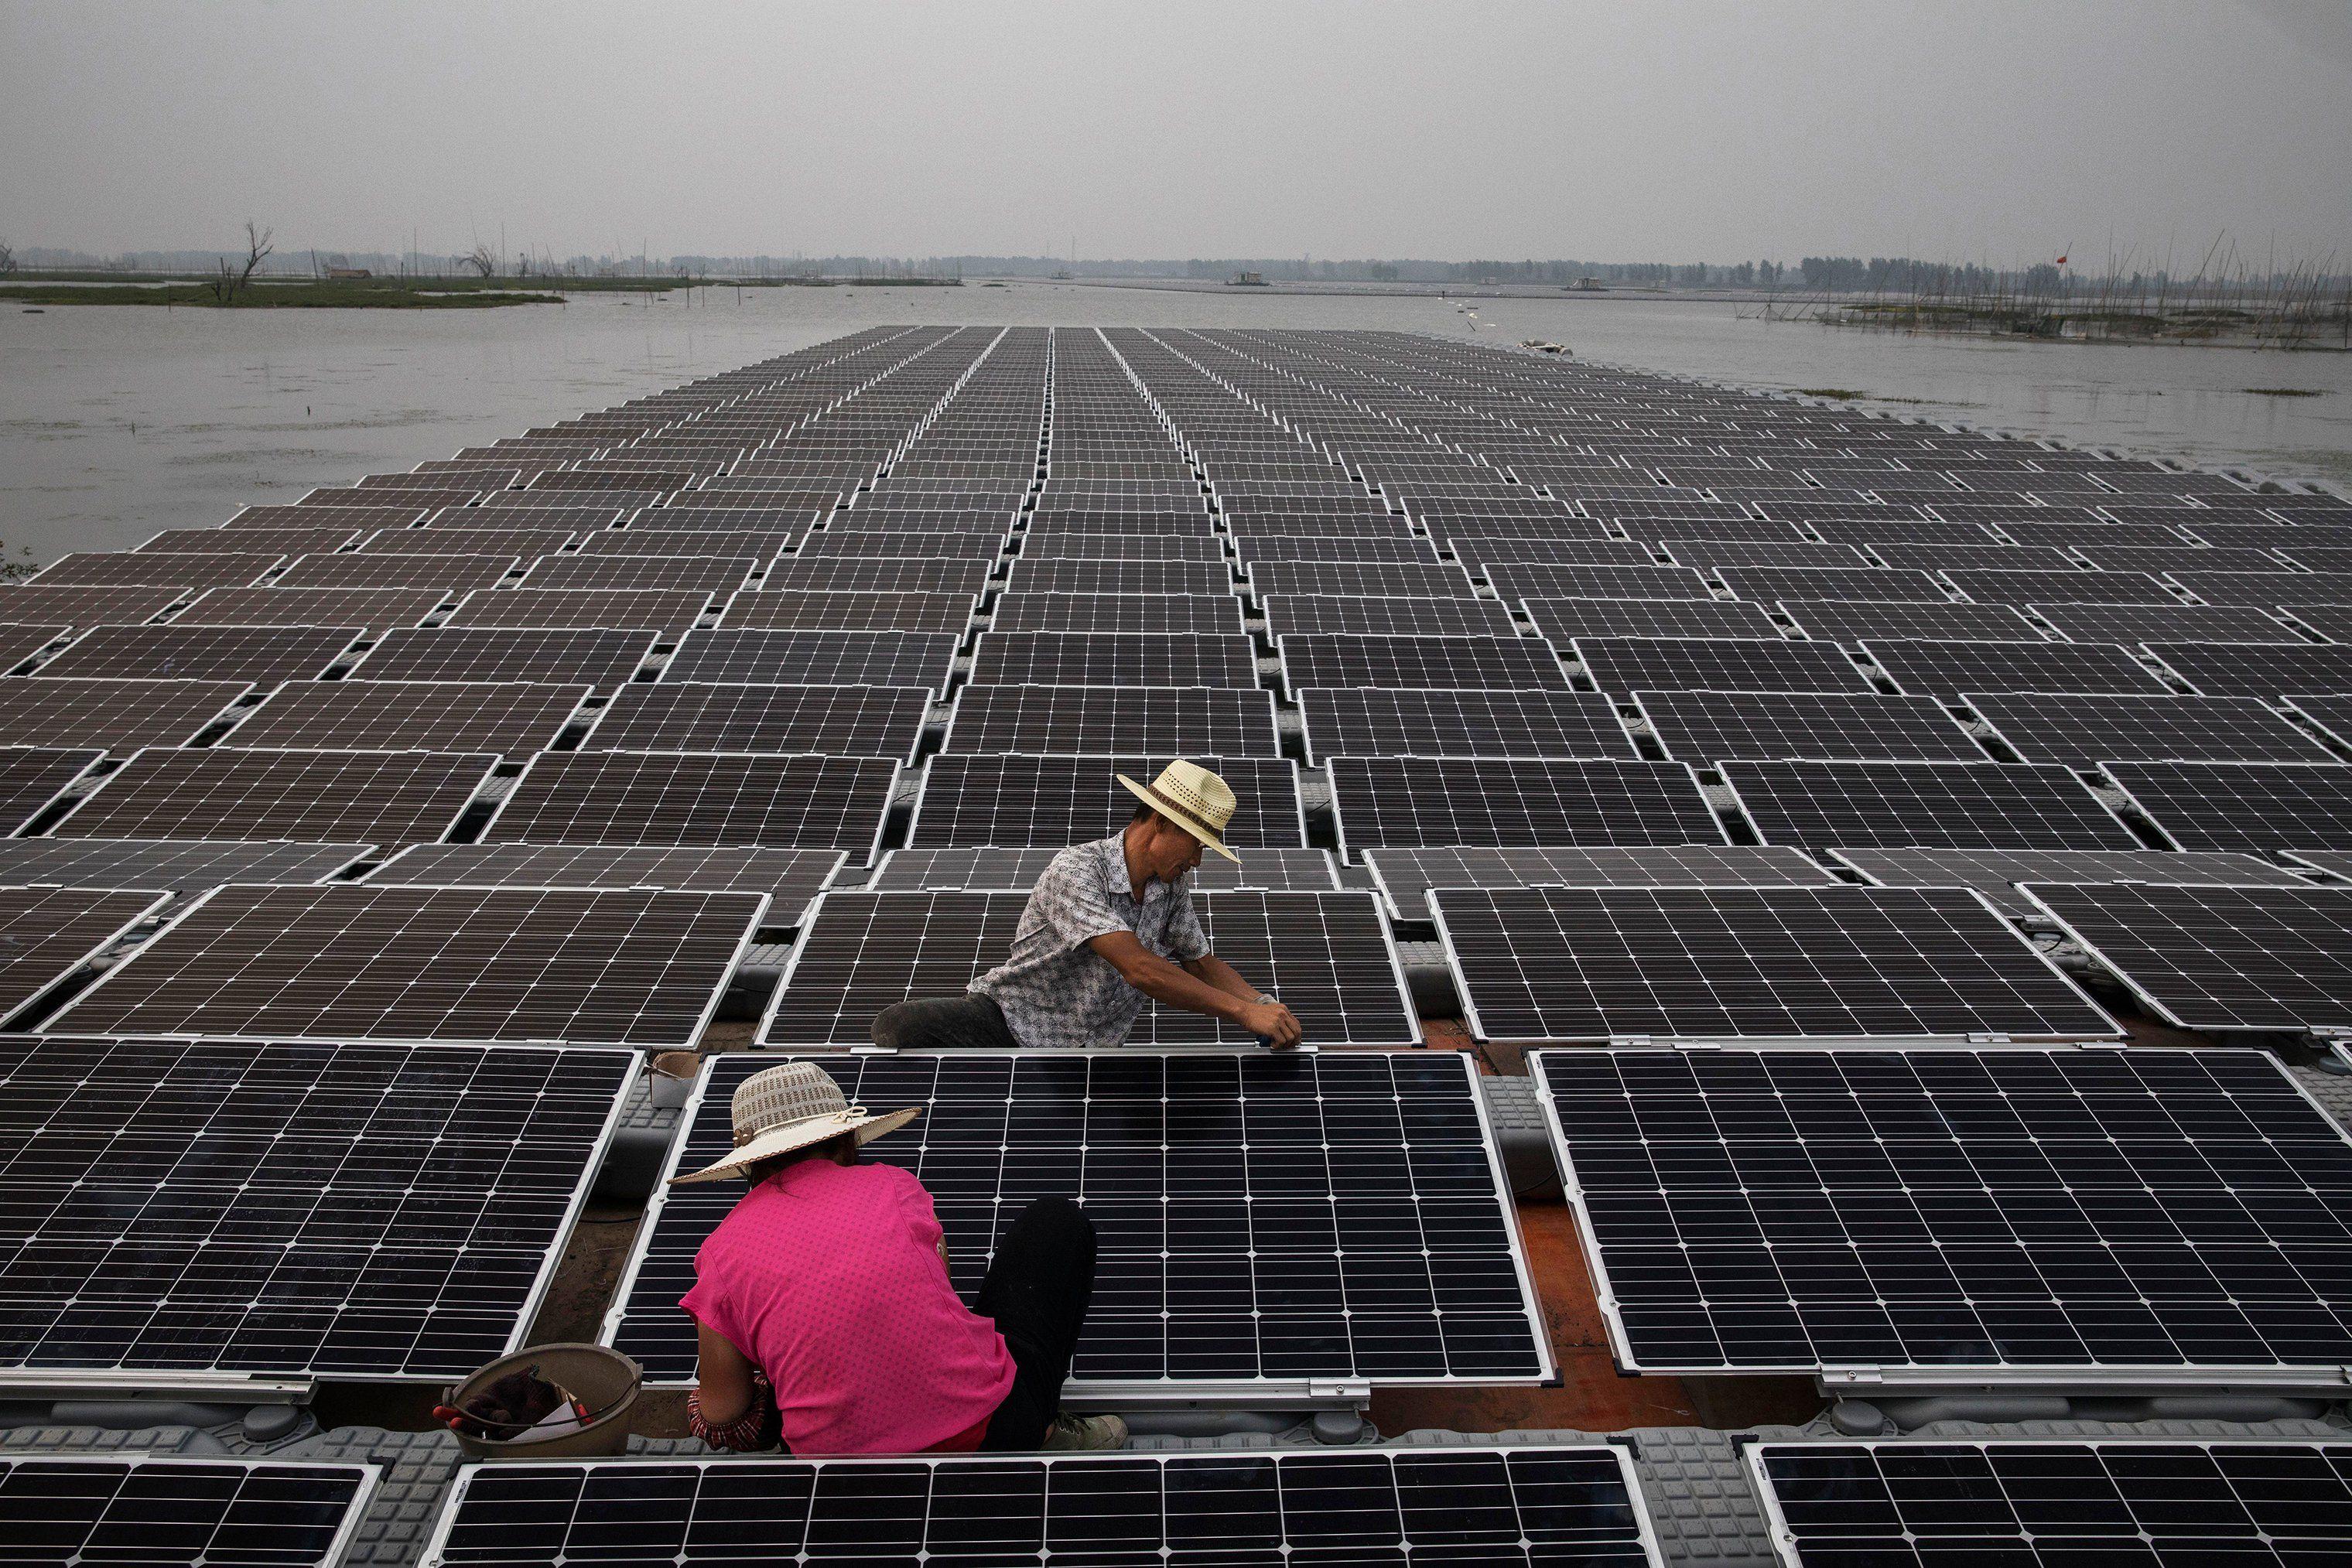 China Builds The World S Largest Floating Solar Farm Solar Panels Solar Farm Solar